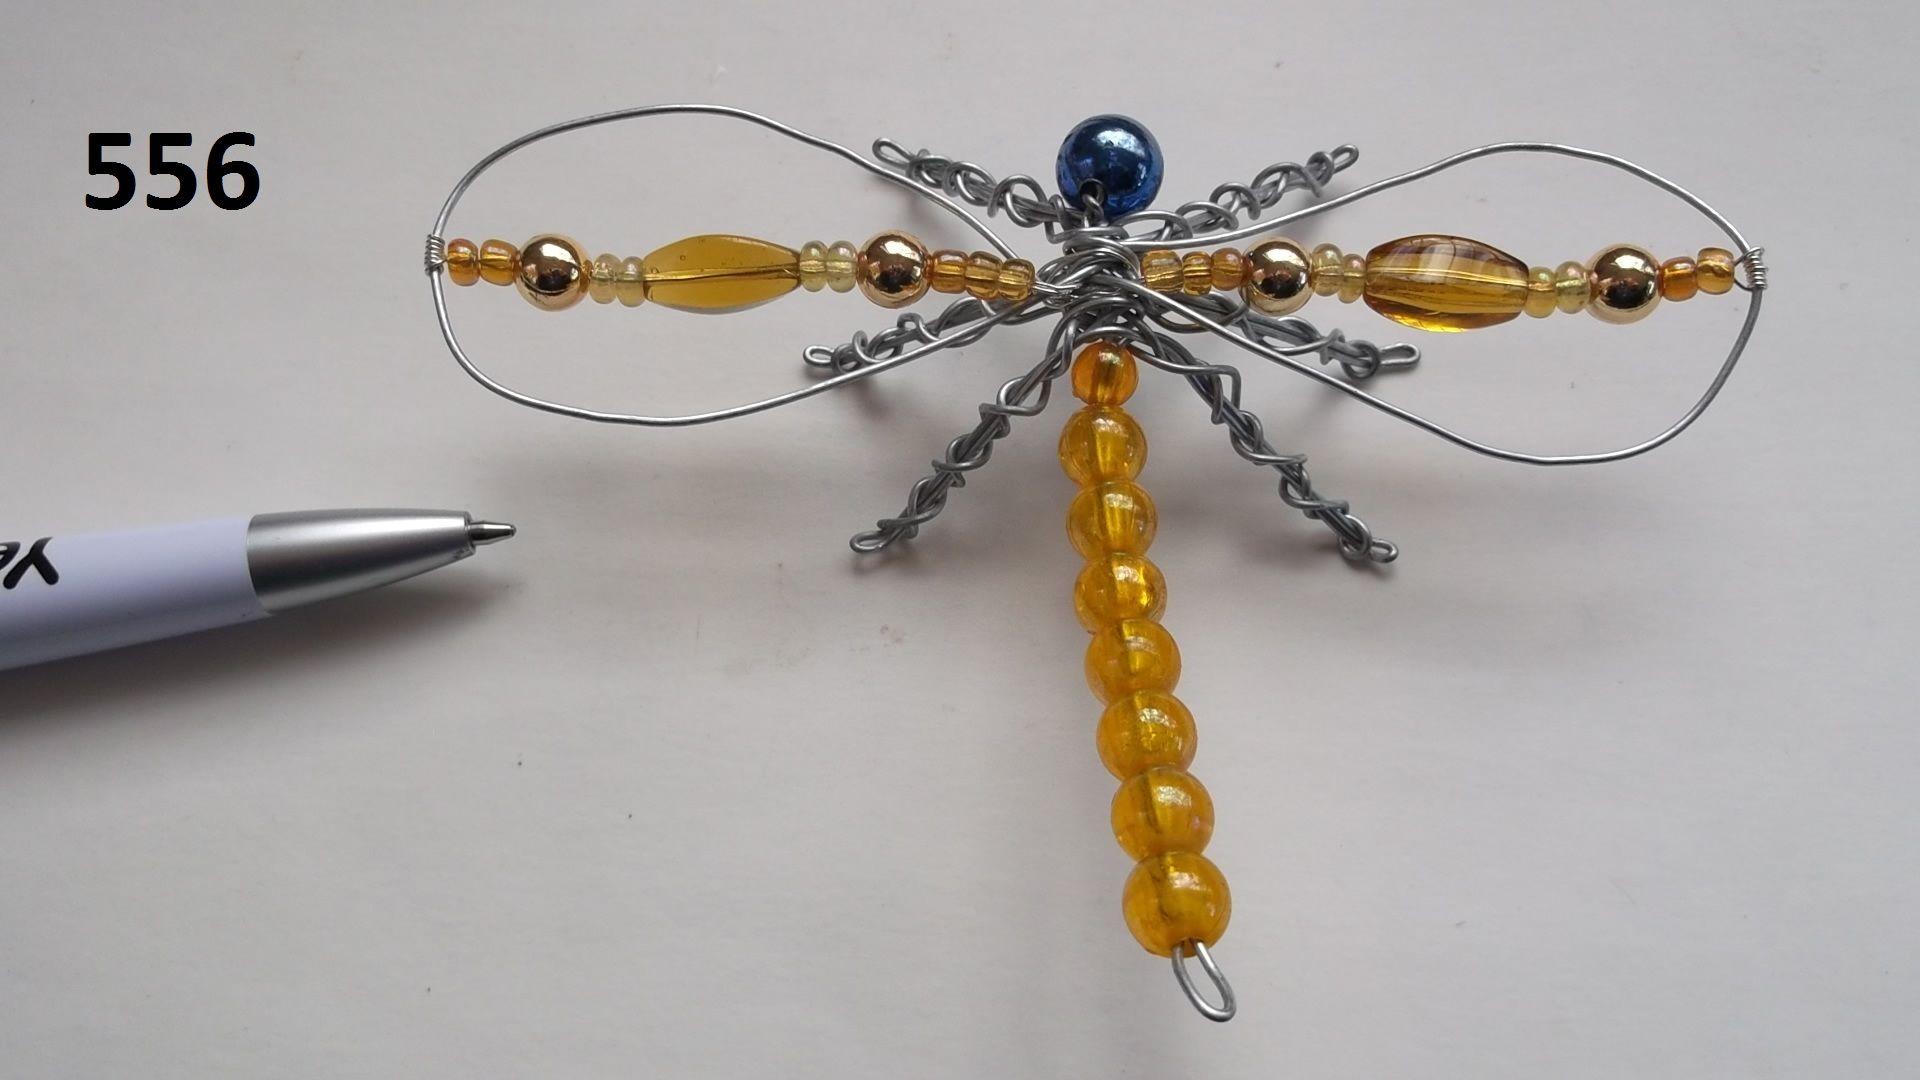 No.556 - a Cute Dragonfly BeadBug - Wire and Bead BeadBugs - Jill ...